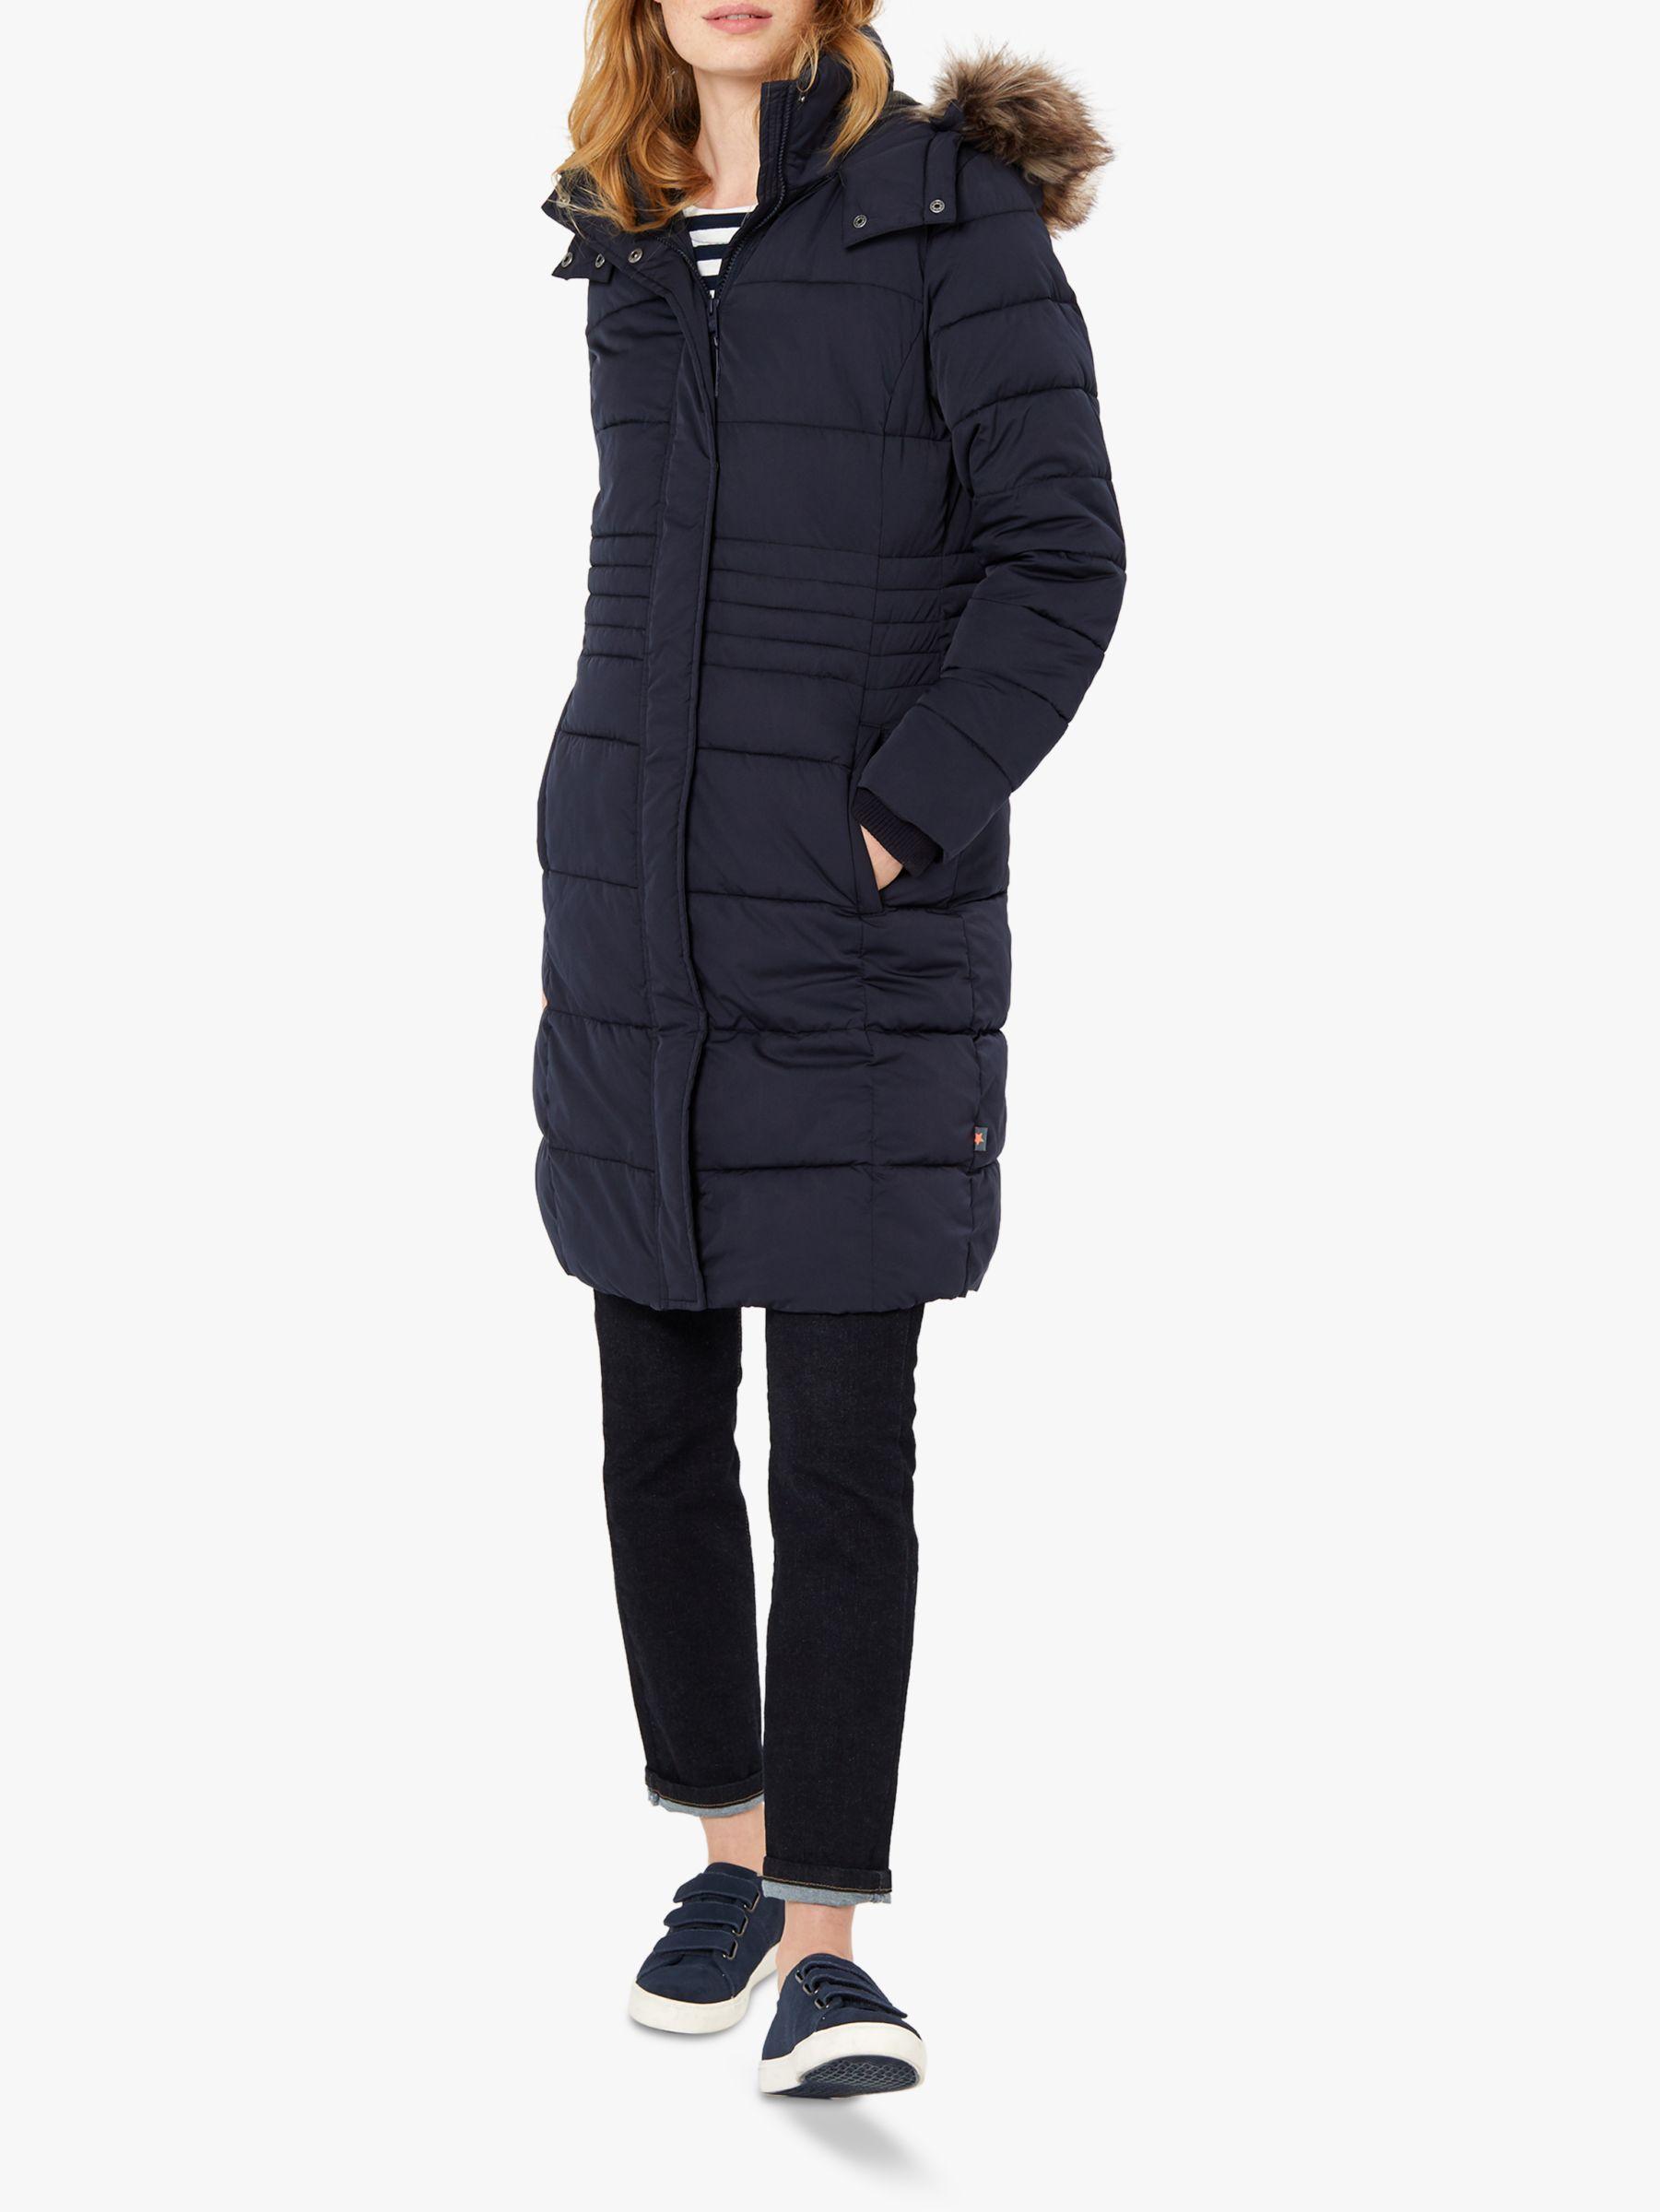 6f60835d4d1 White Stuff Thirlmere Long Puffer Coat at John Lewis & Partners